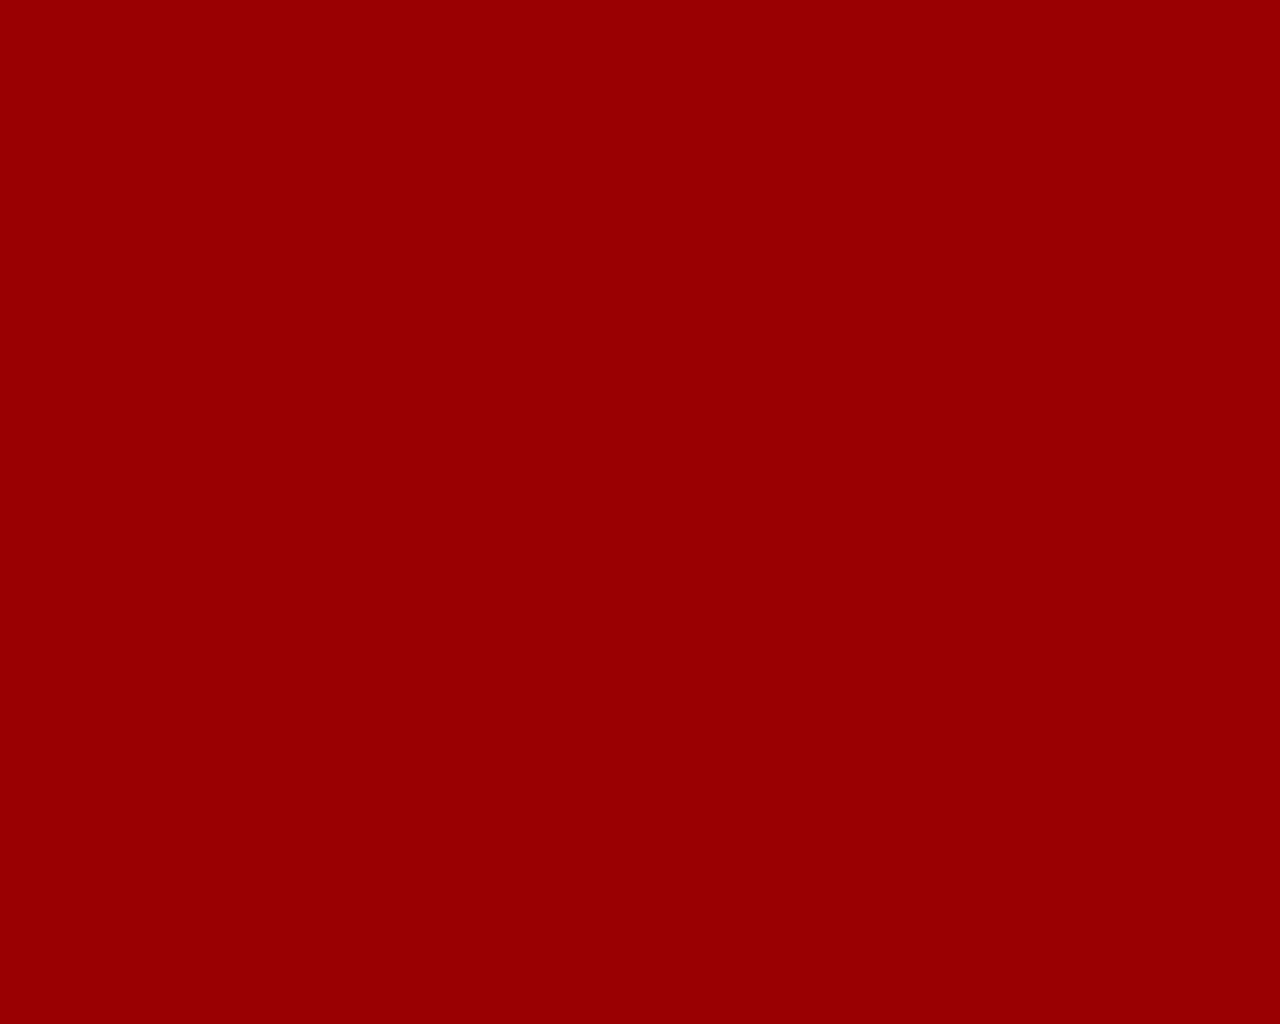 1280x1024 Stizza Solid Color Background